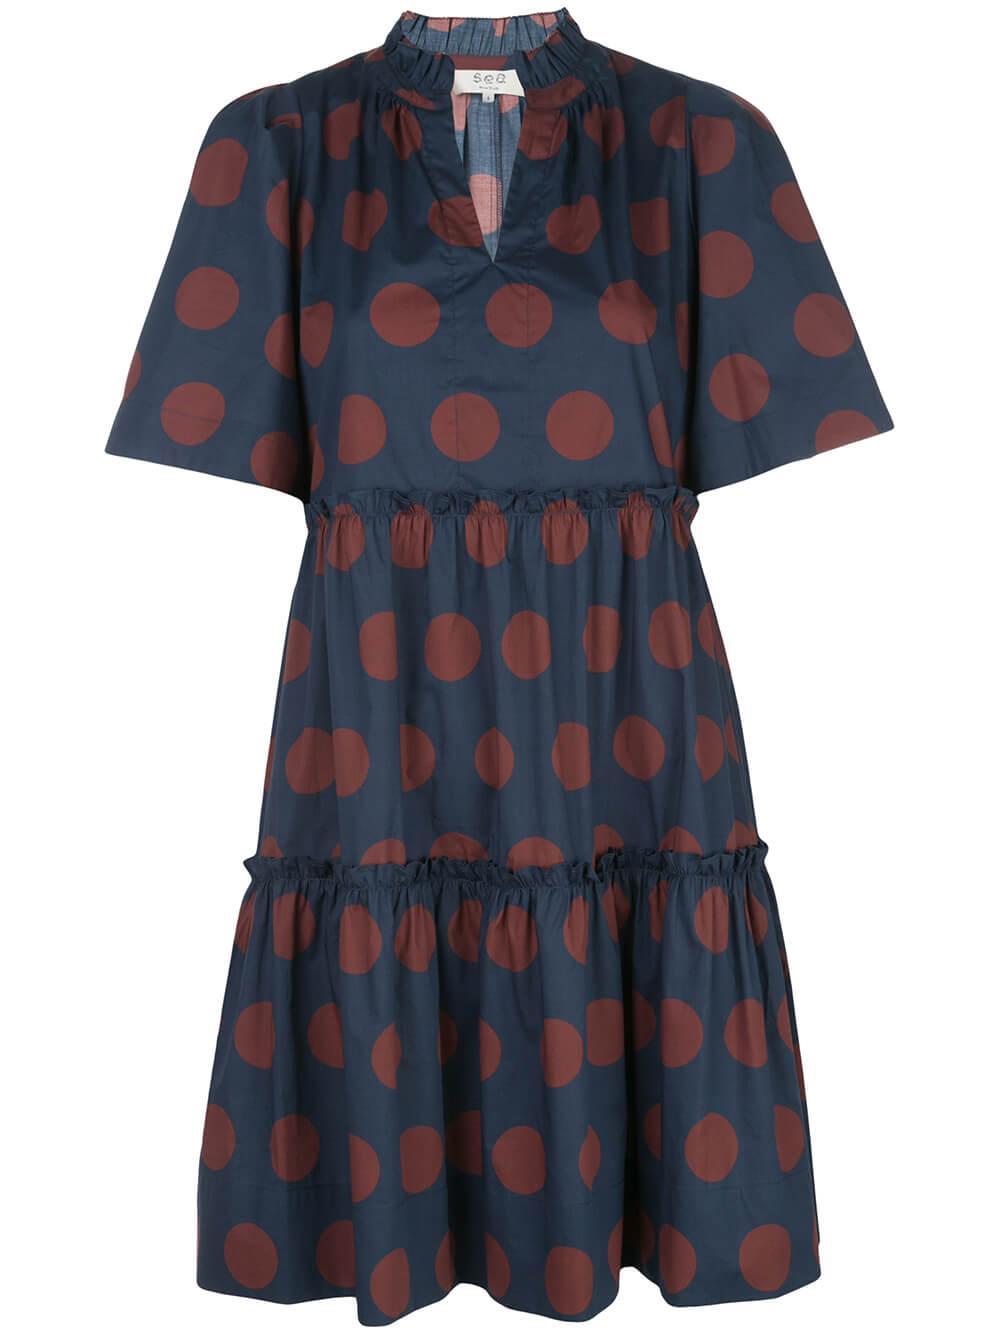 Penny Short Sleeve Polka Dot Dress Item # RS20-76